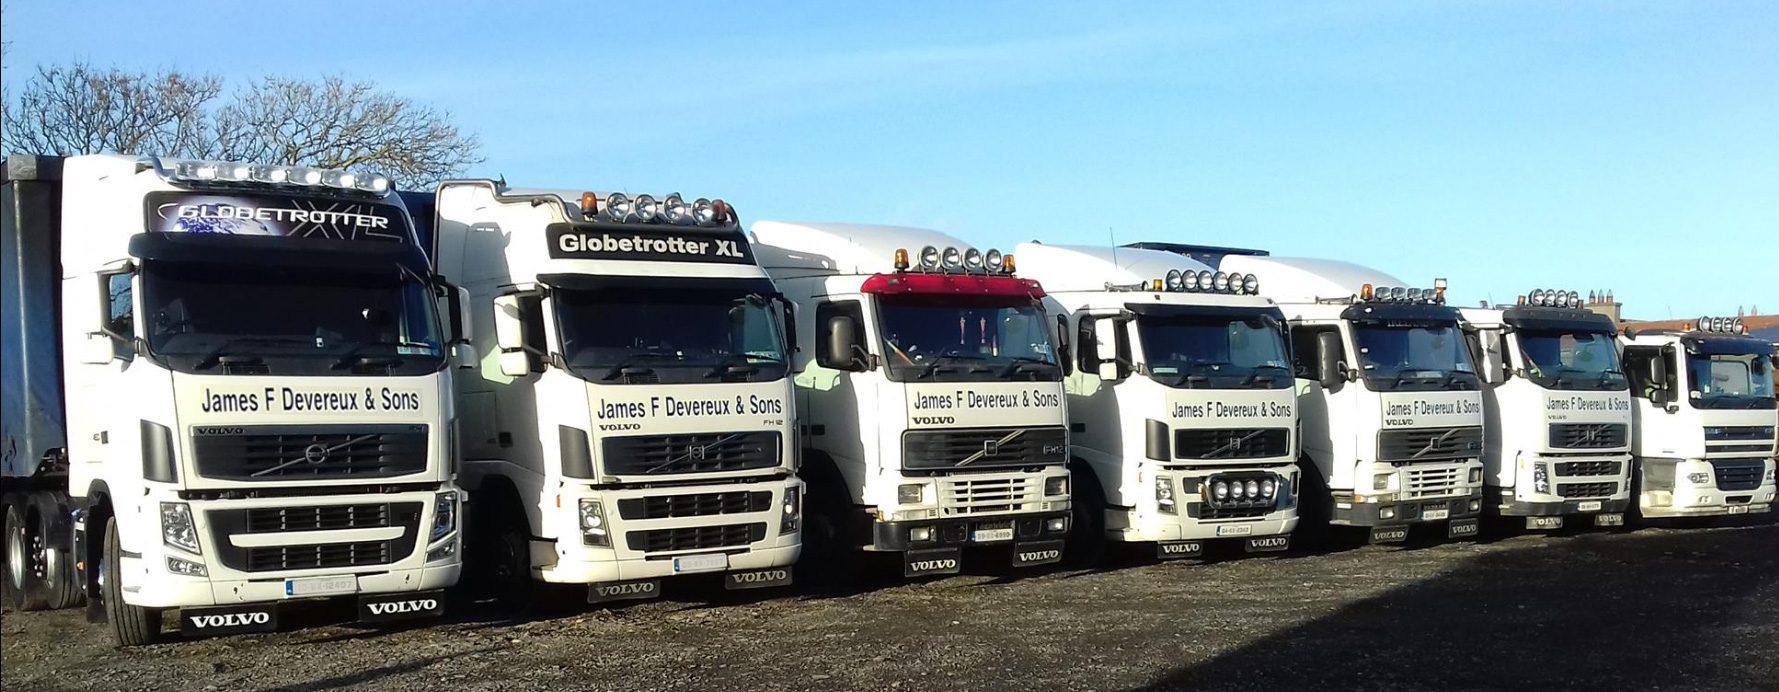 James F Devereux & Sons Tranport Ltd - Wexford, Ireland -Header